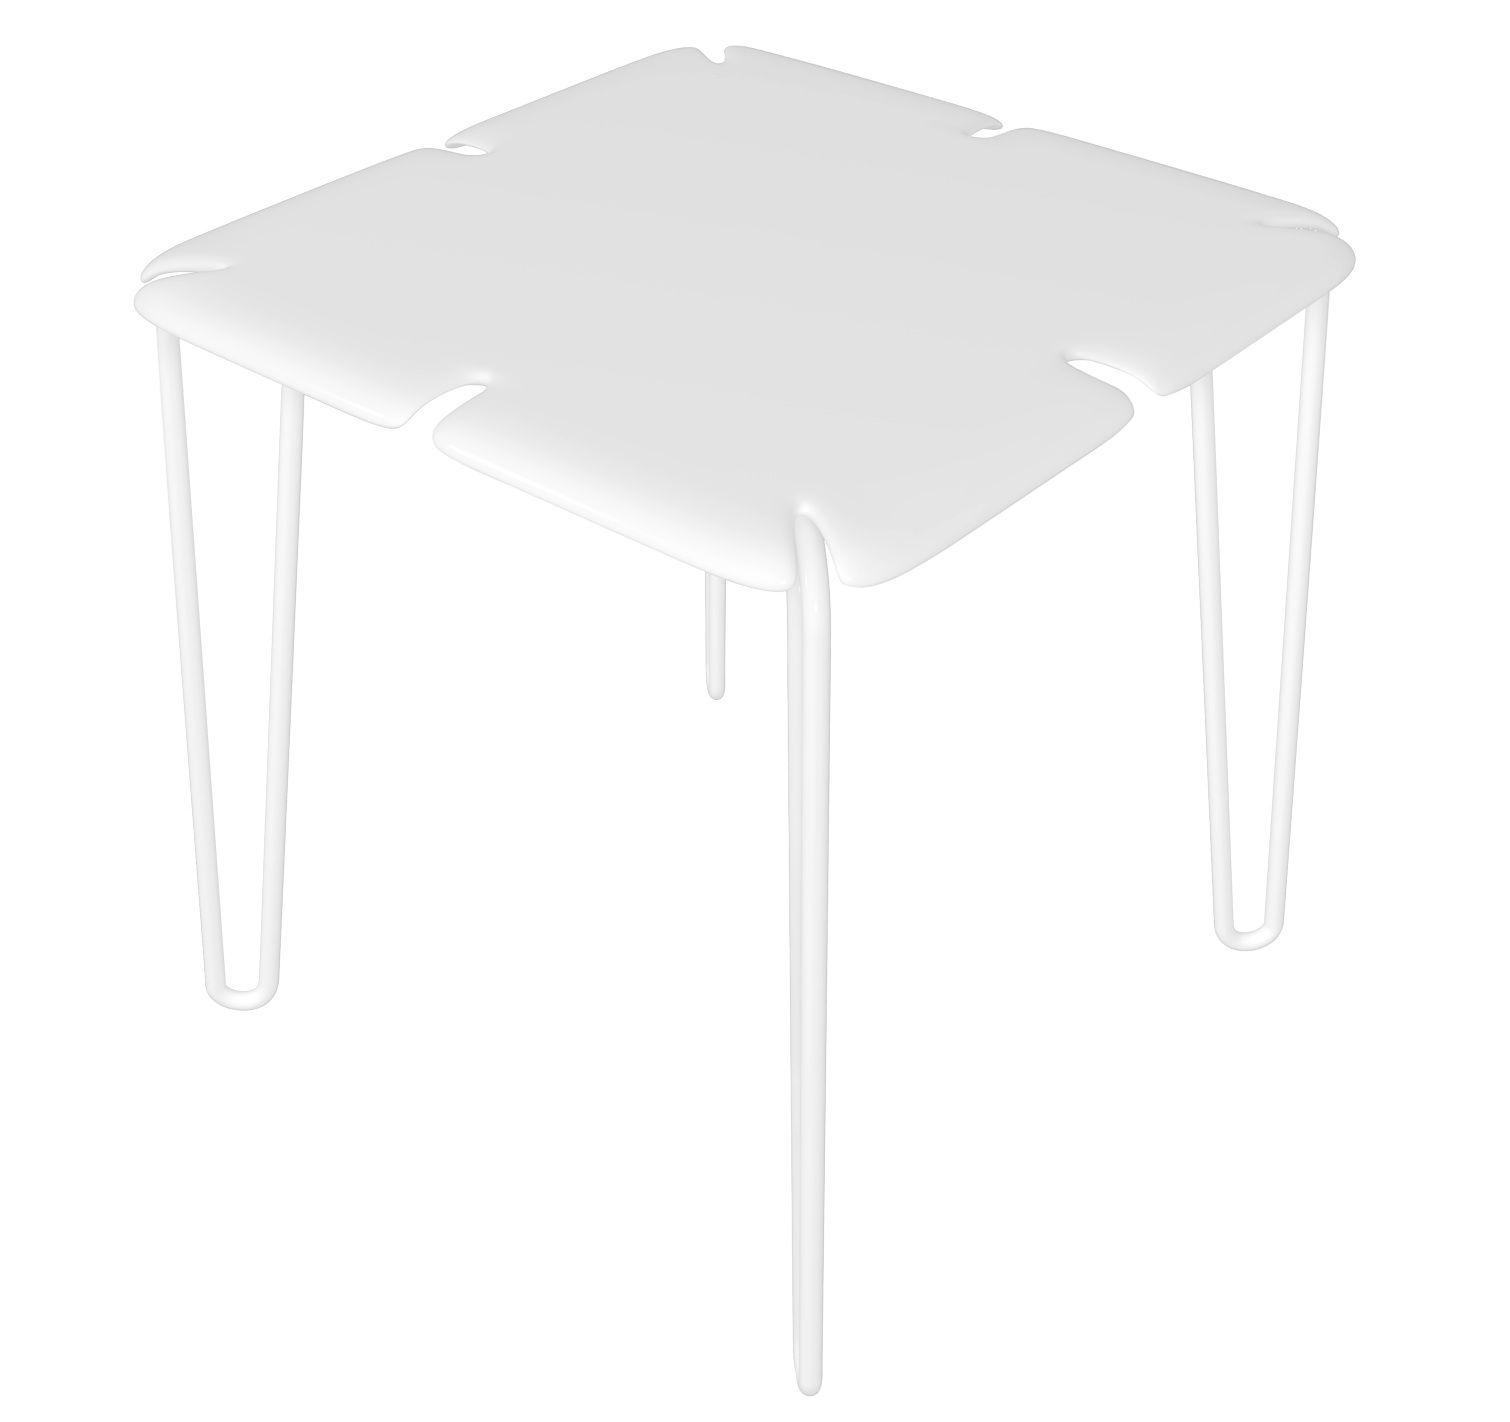 Jardin - Tables de jardin - Table carrée Chips / 78 x 78 cm - MyYour - Blanc - Corian - Acier inoxydable peint, Corian